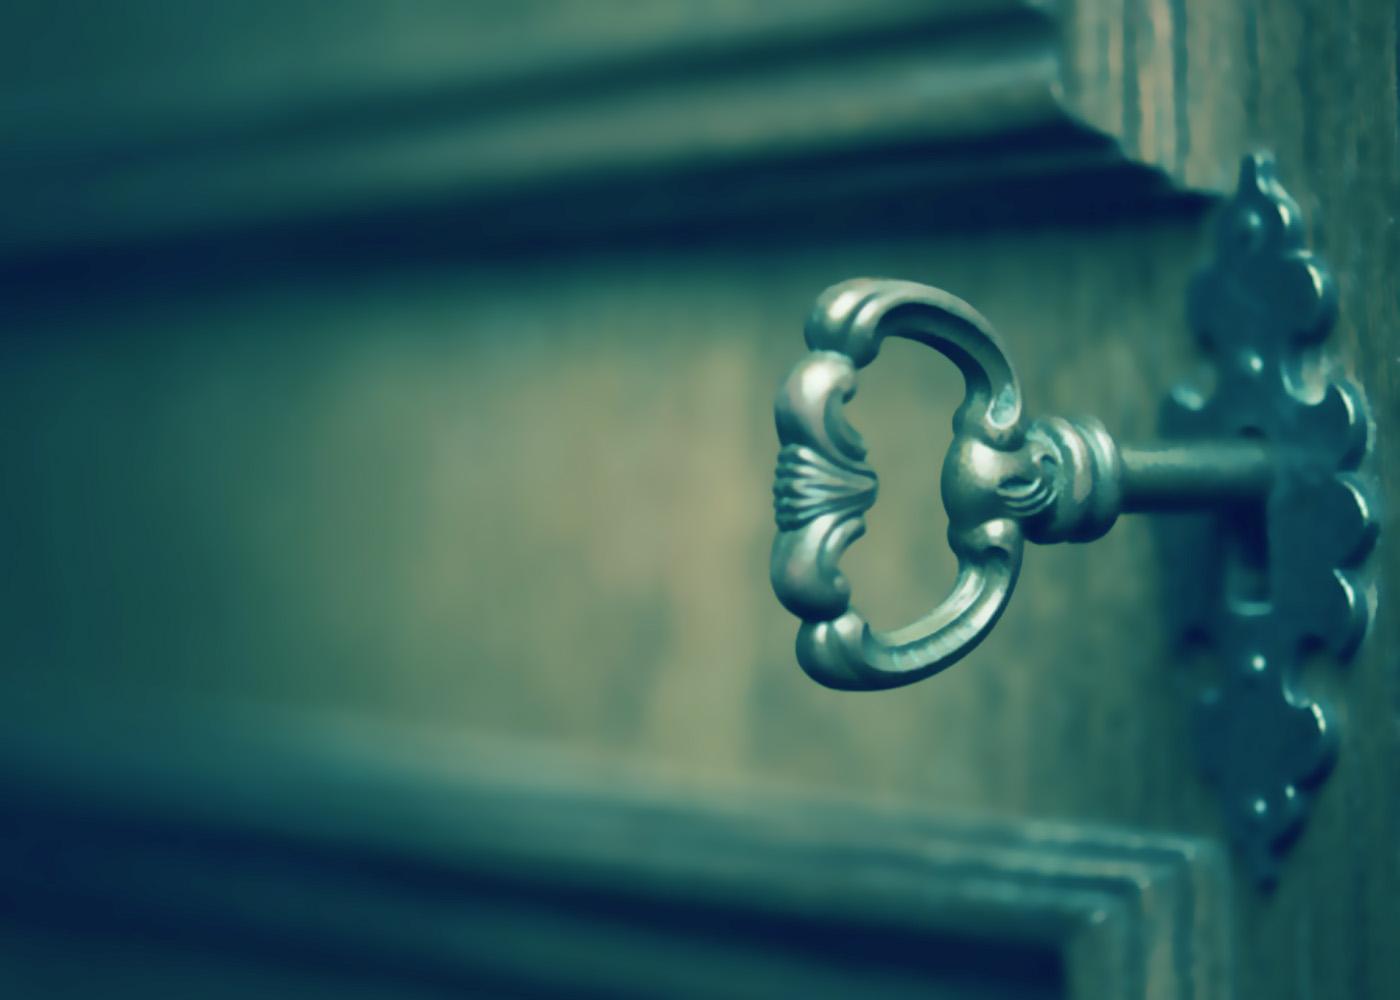 Abrir puerta cerradura atascada